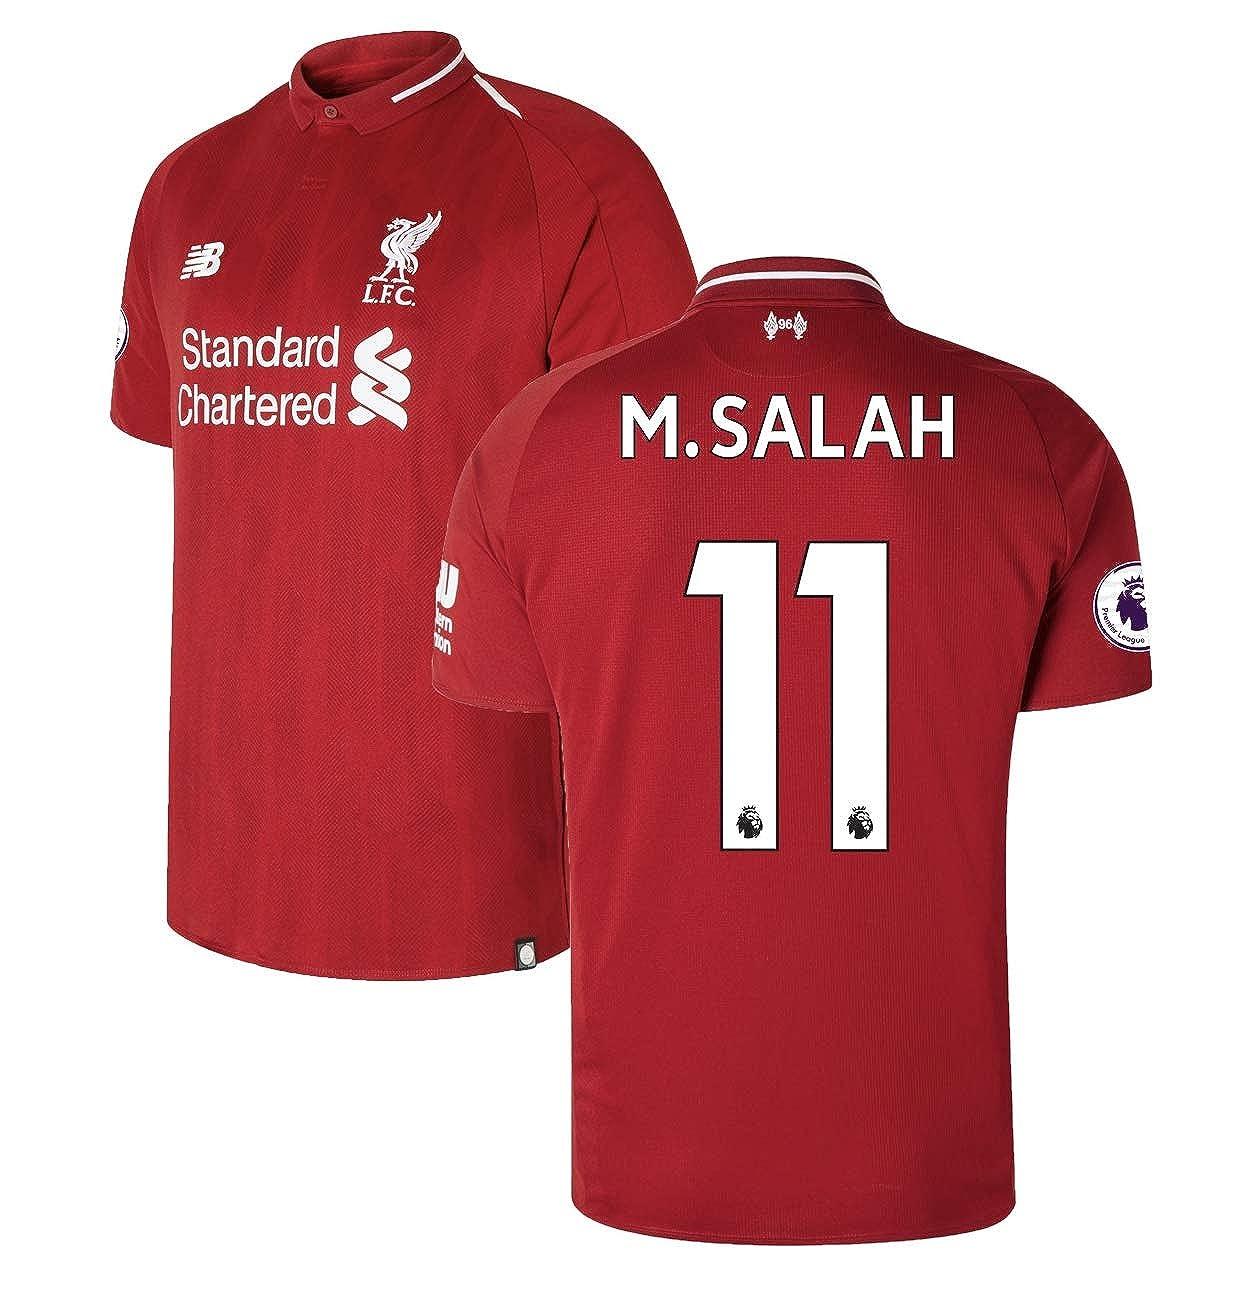 online store 44d83 22cfa salah jersey